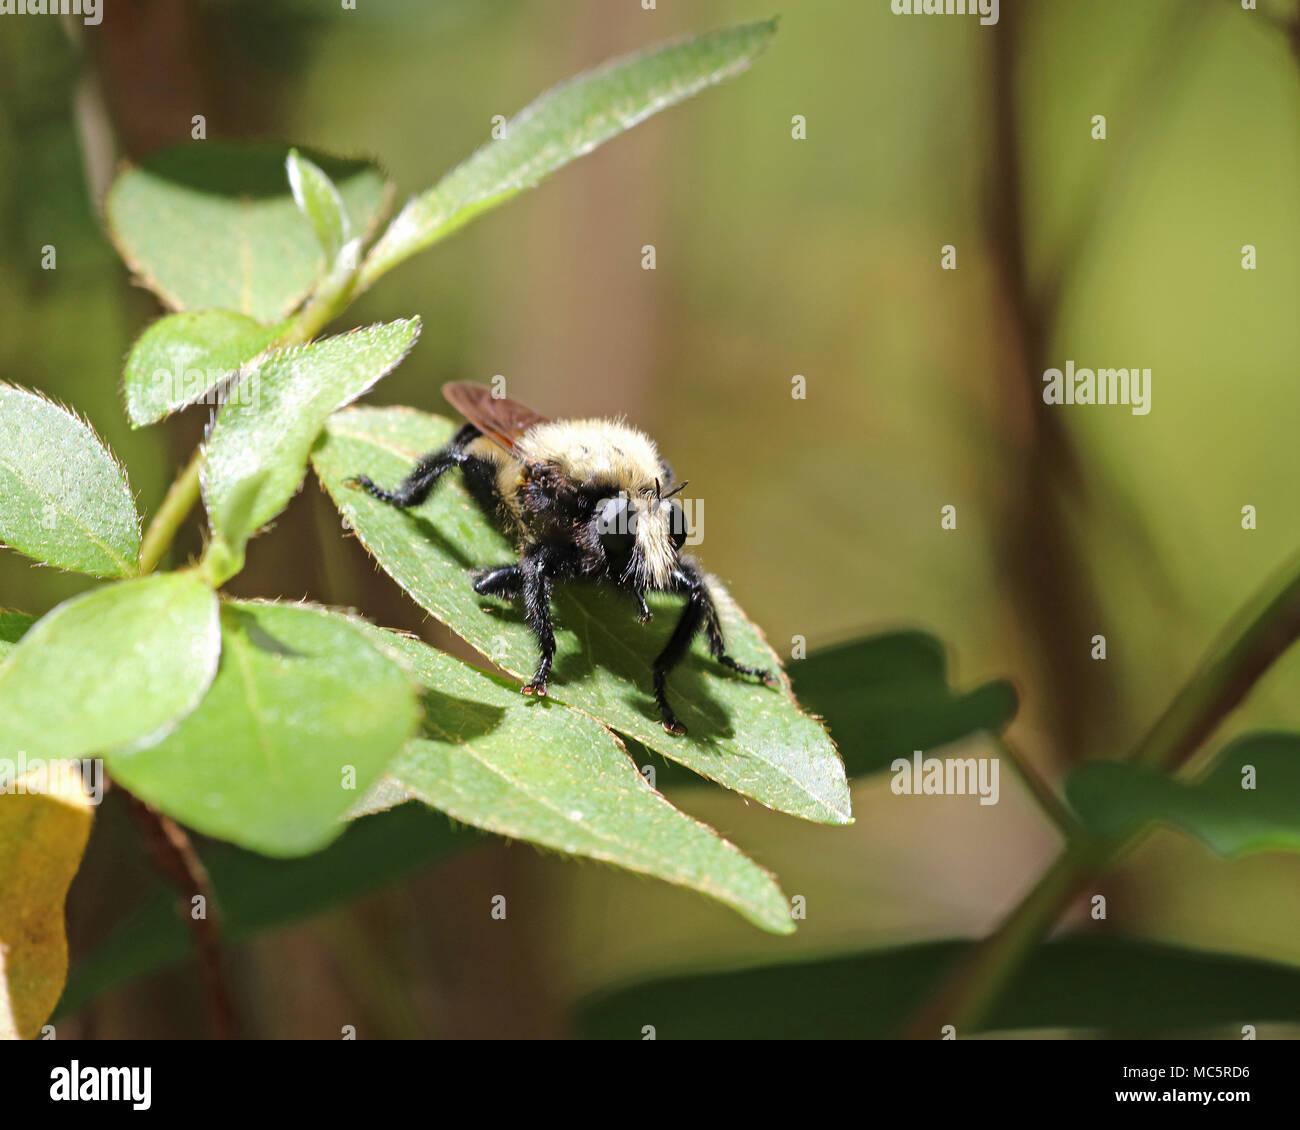 Close-up of a Florida Bee killer (Mallophora bomboides) - Stock Image